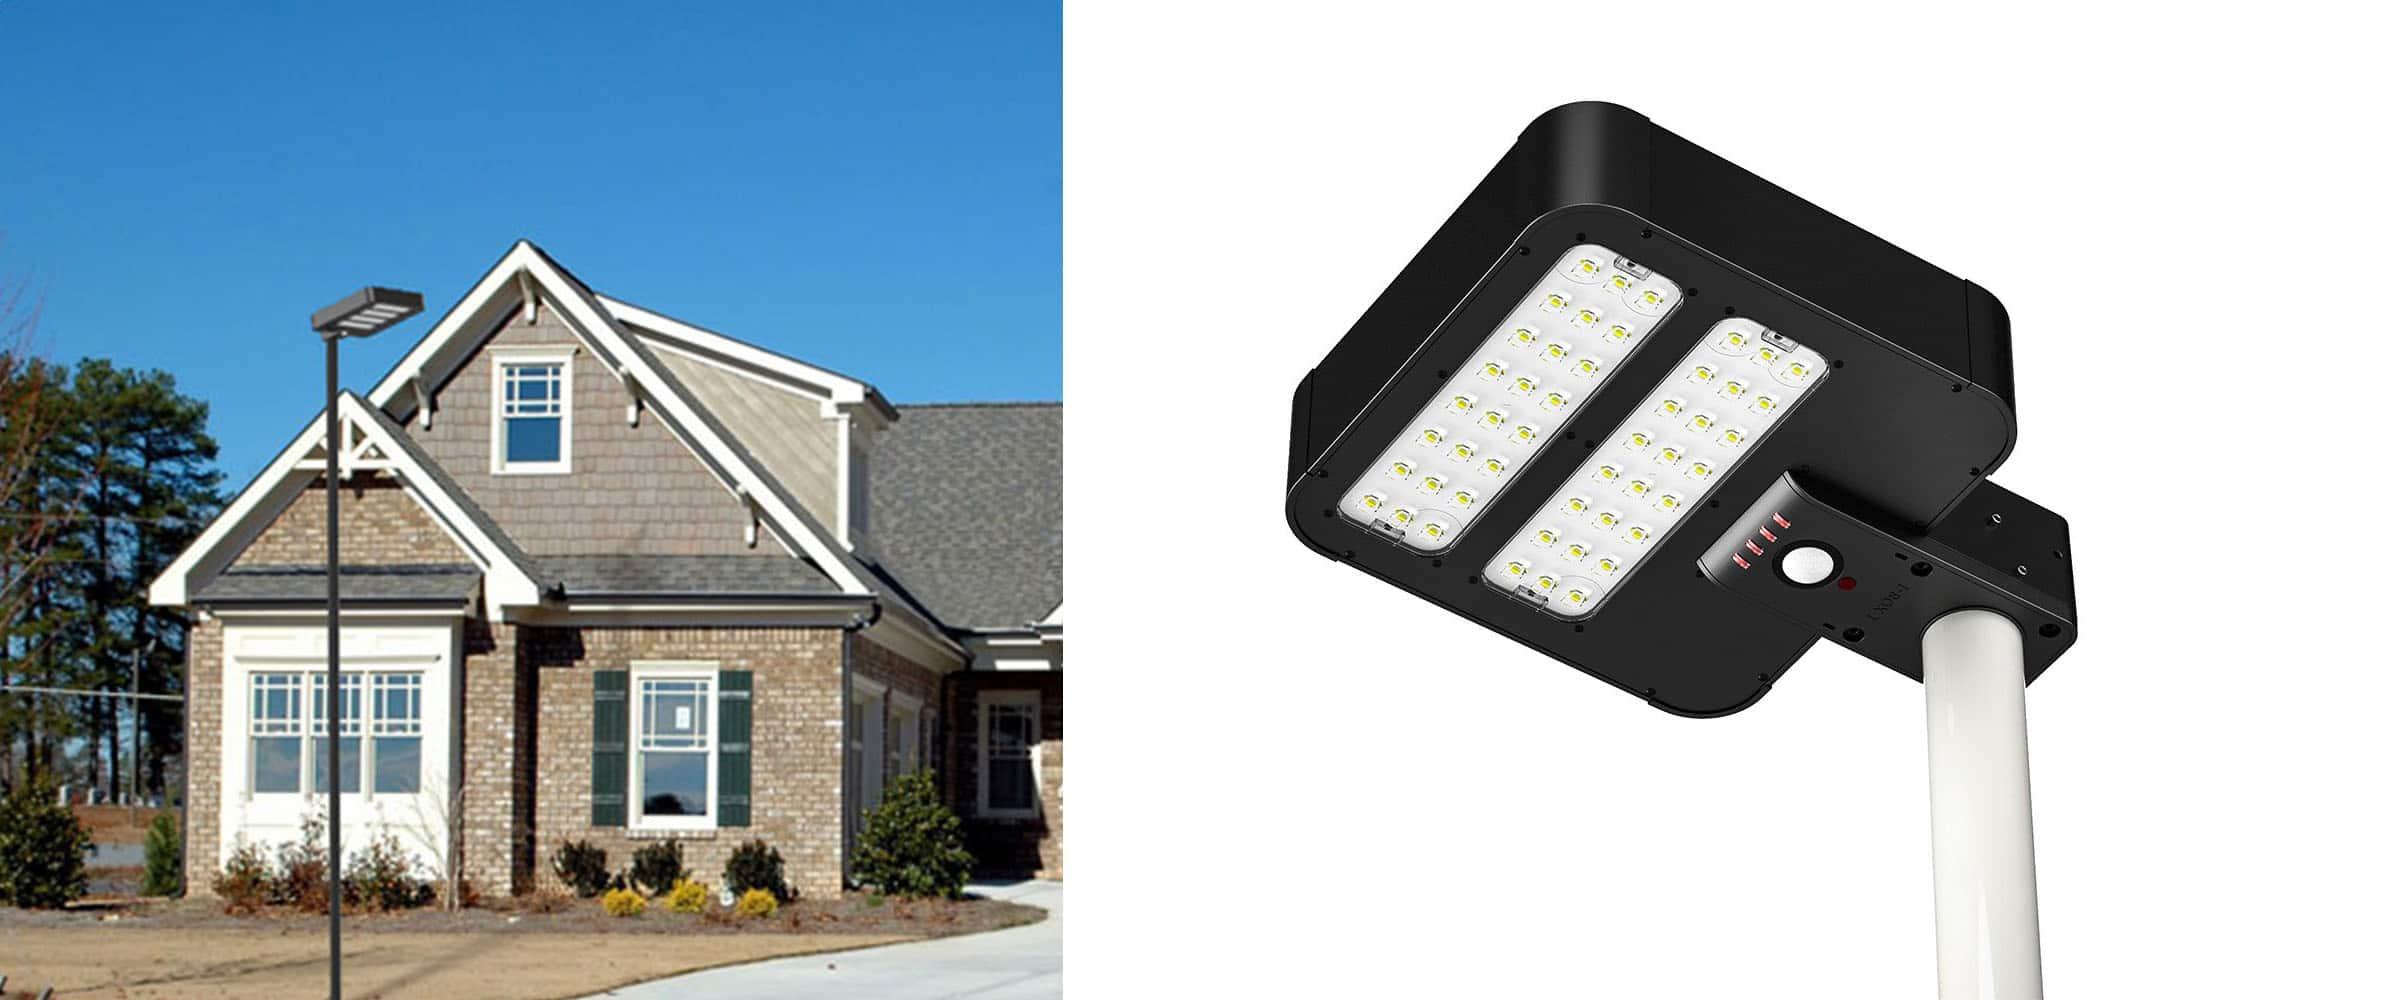 Solarna kompaktowa latarnia